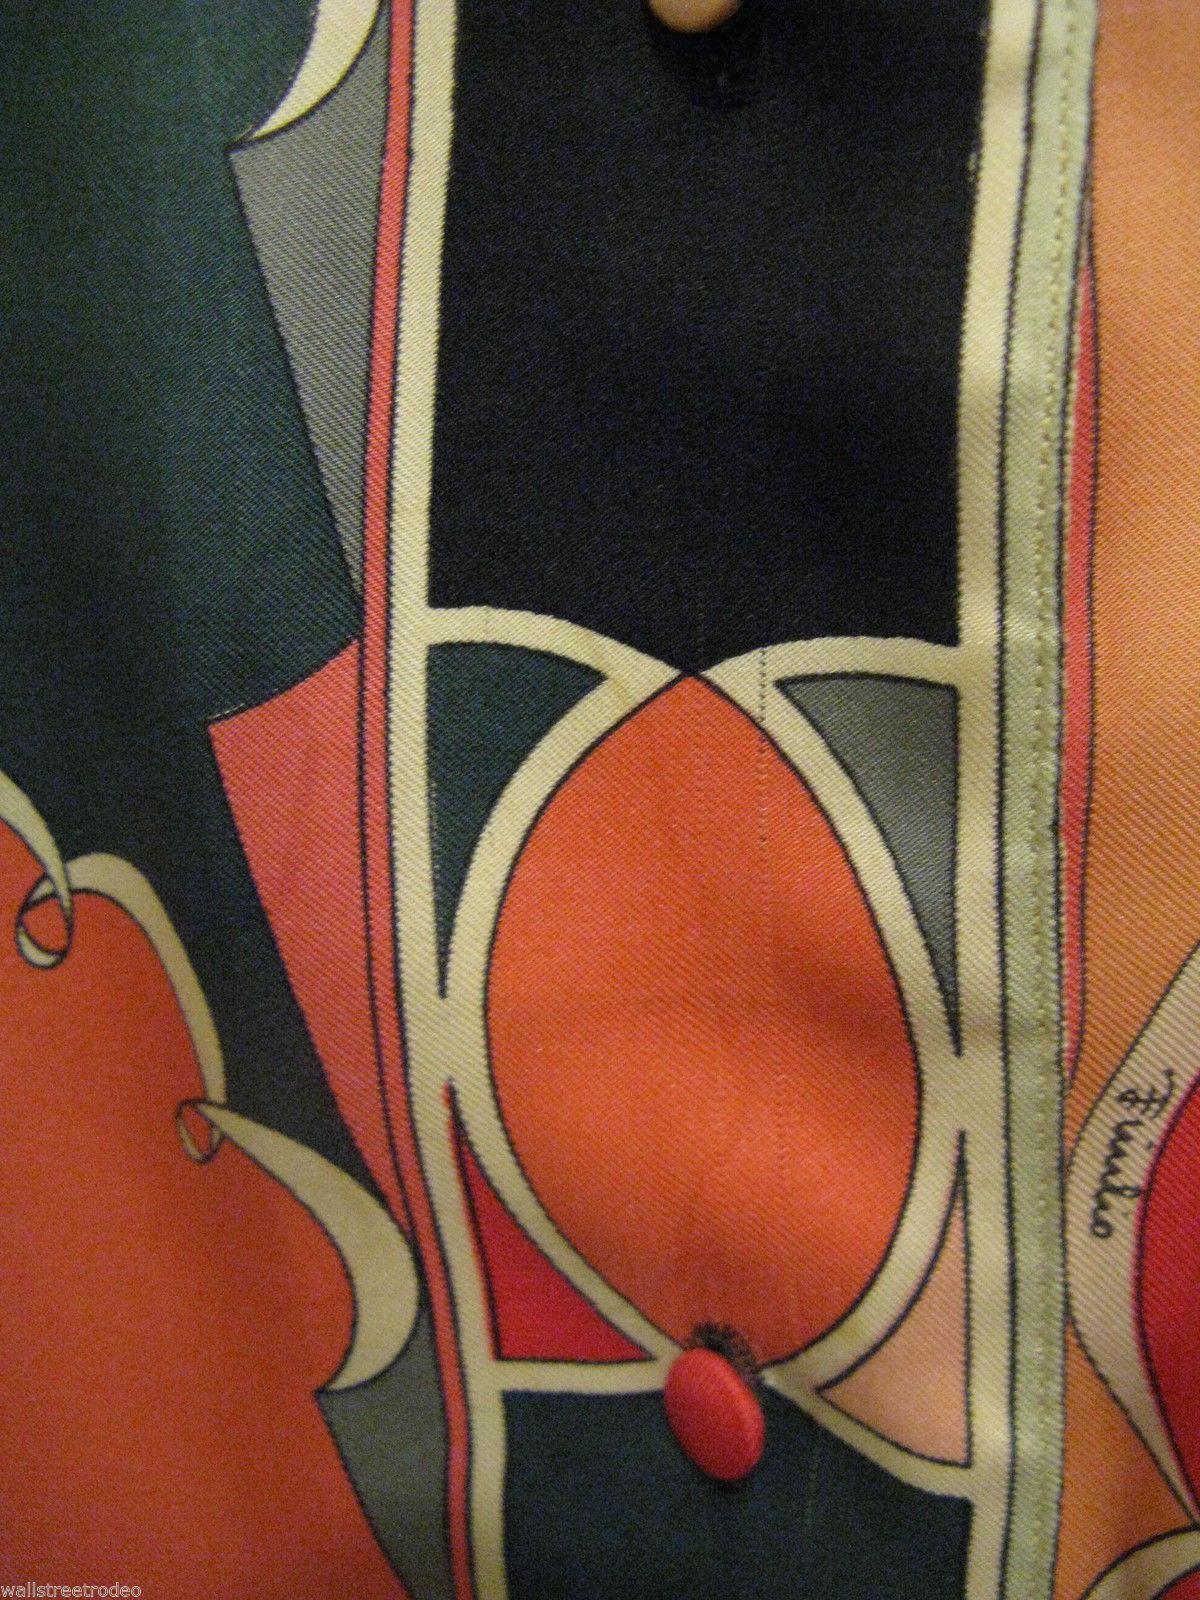 Vintage Emilio Pucci Saks fifth Avenue Iconic pop art silk 1960s Italy shirt 8 image 6